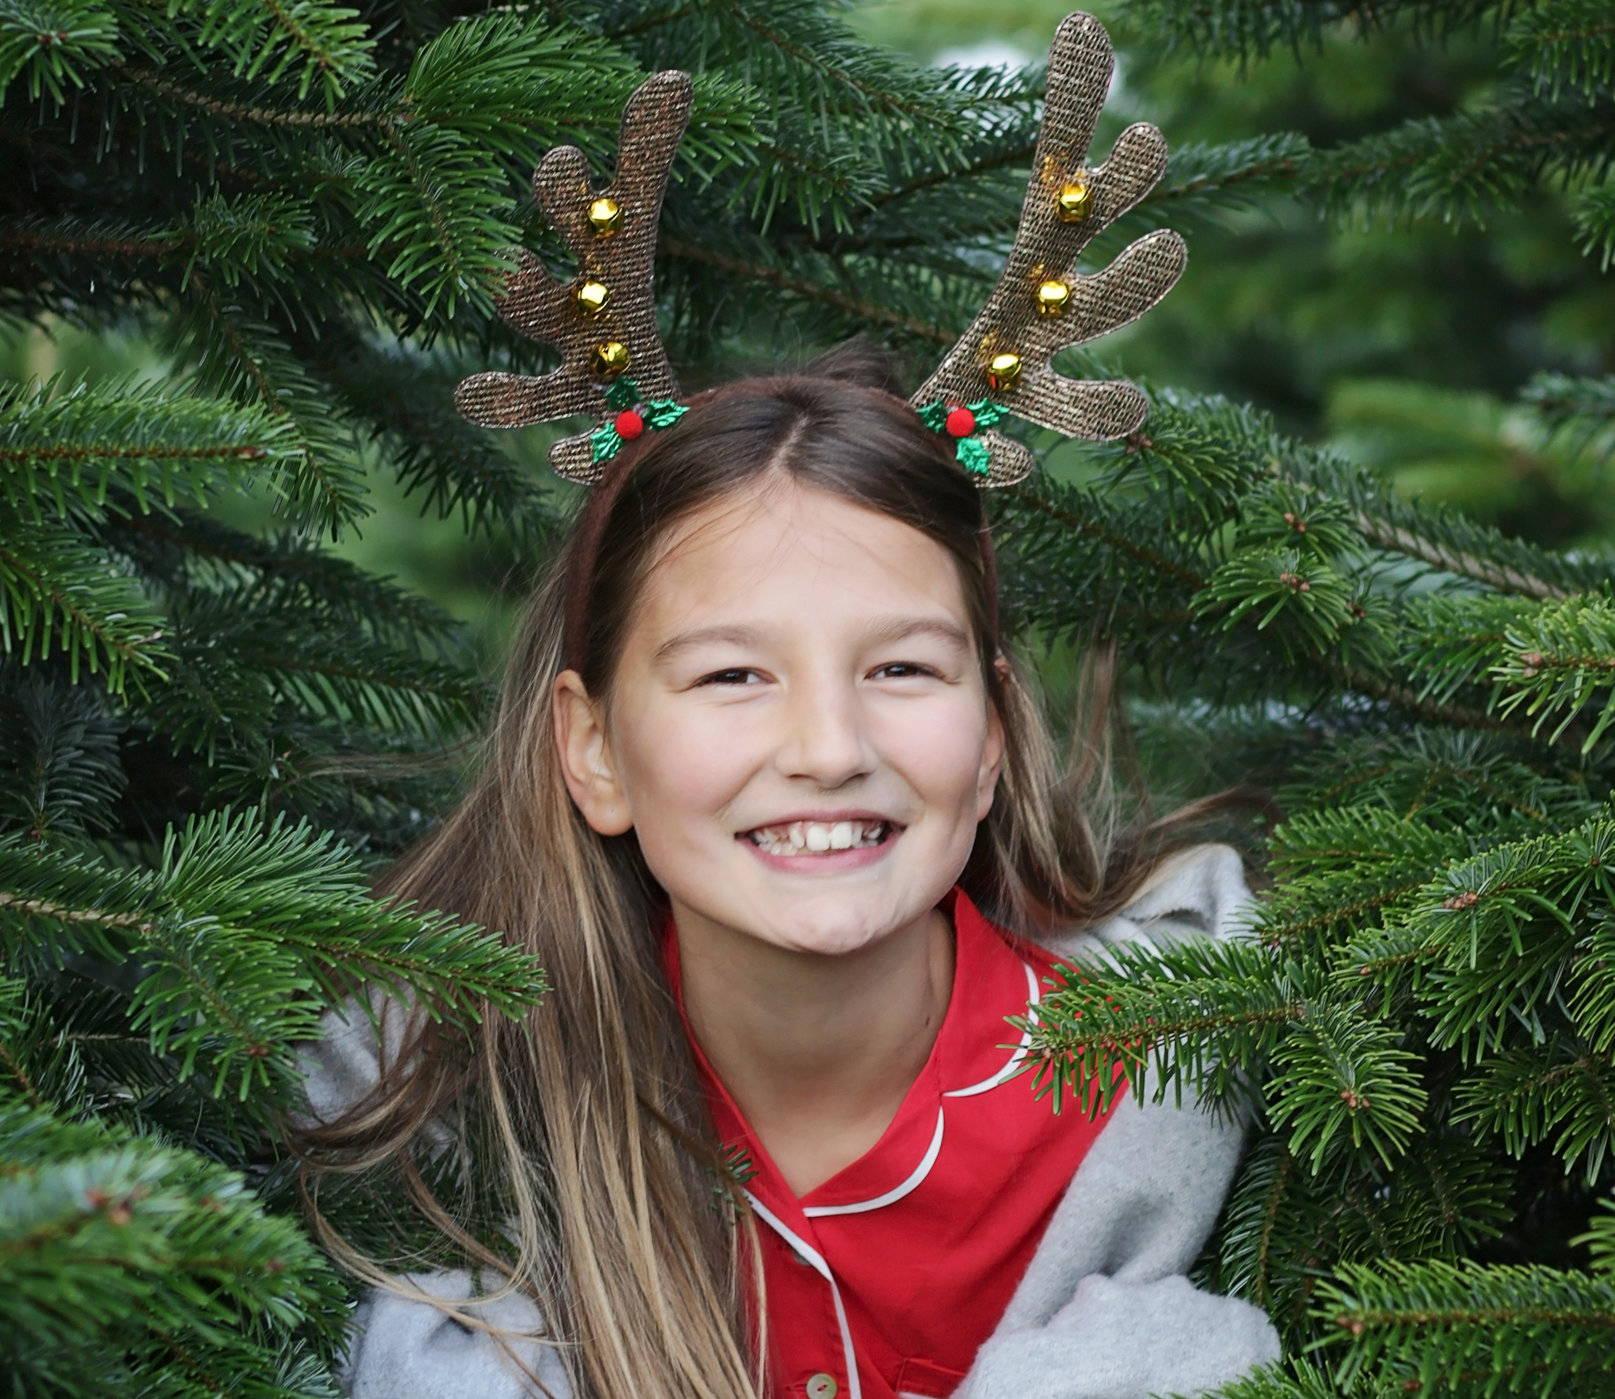 a girl smiling while wearing raindeer horn headband